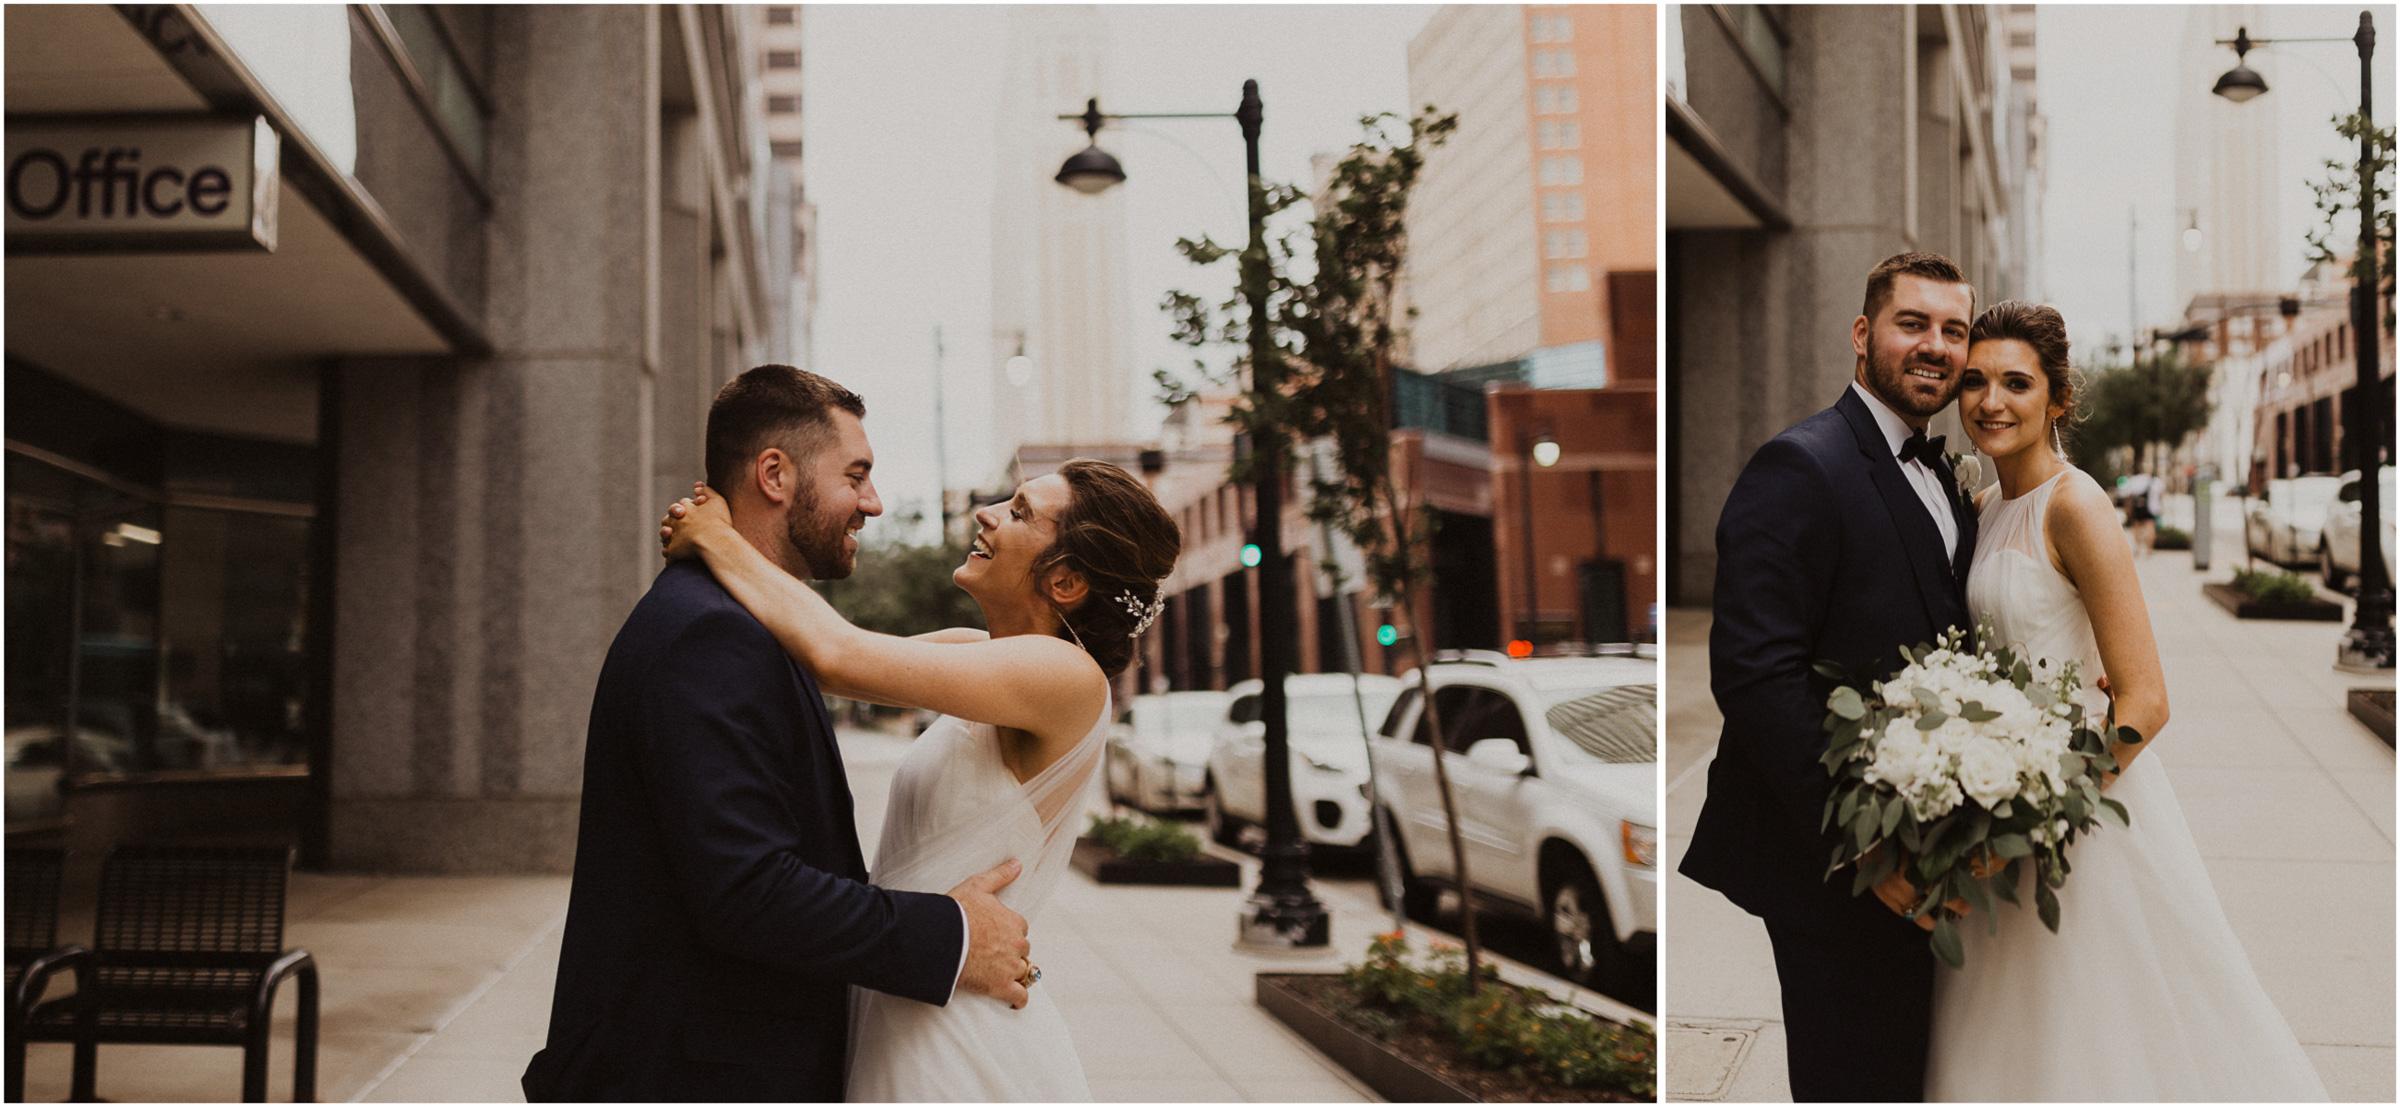 alyssa barletter photography classic downtown kansas city wedding boulevard brewery-50.jpg